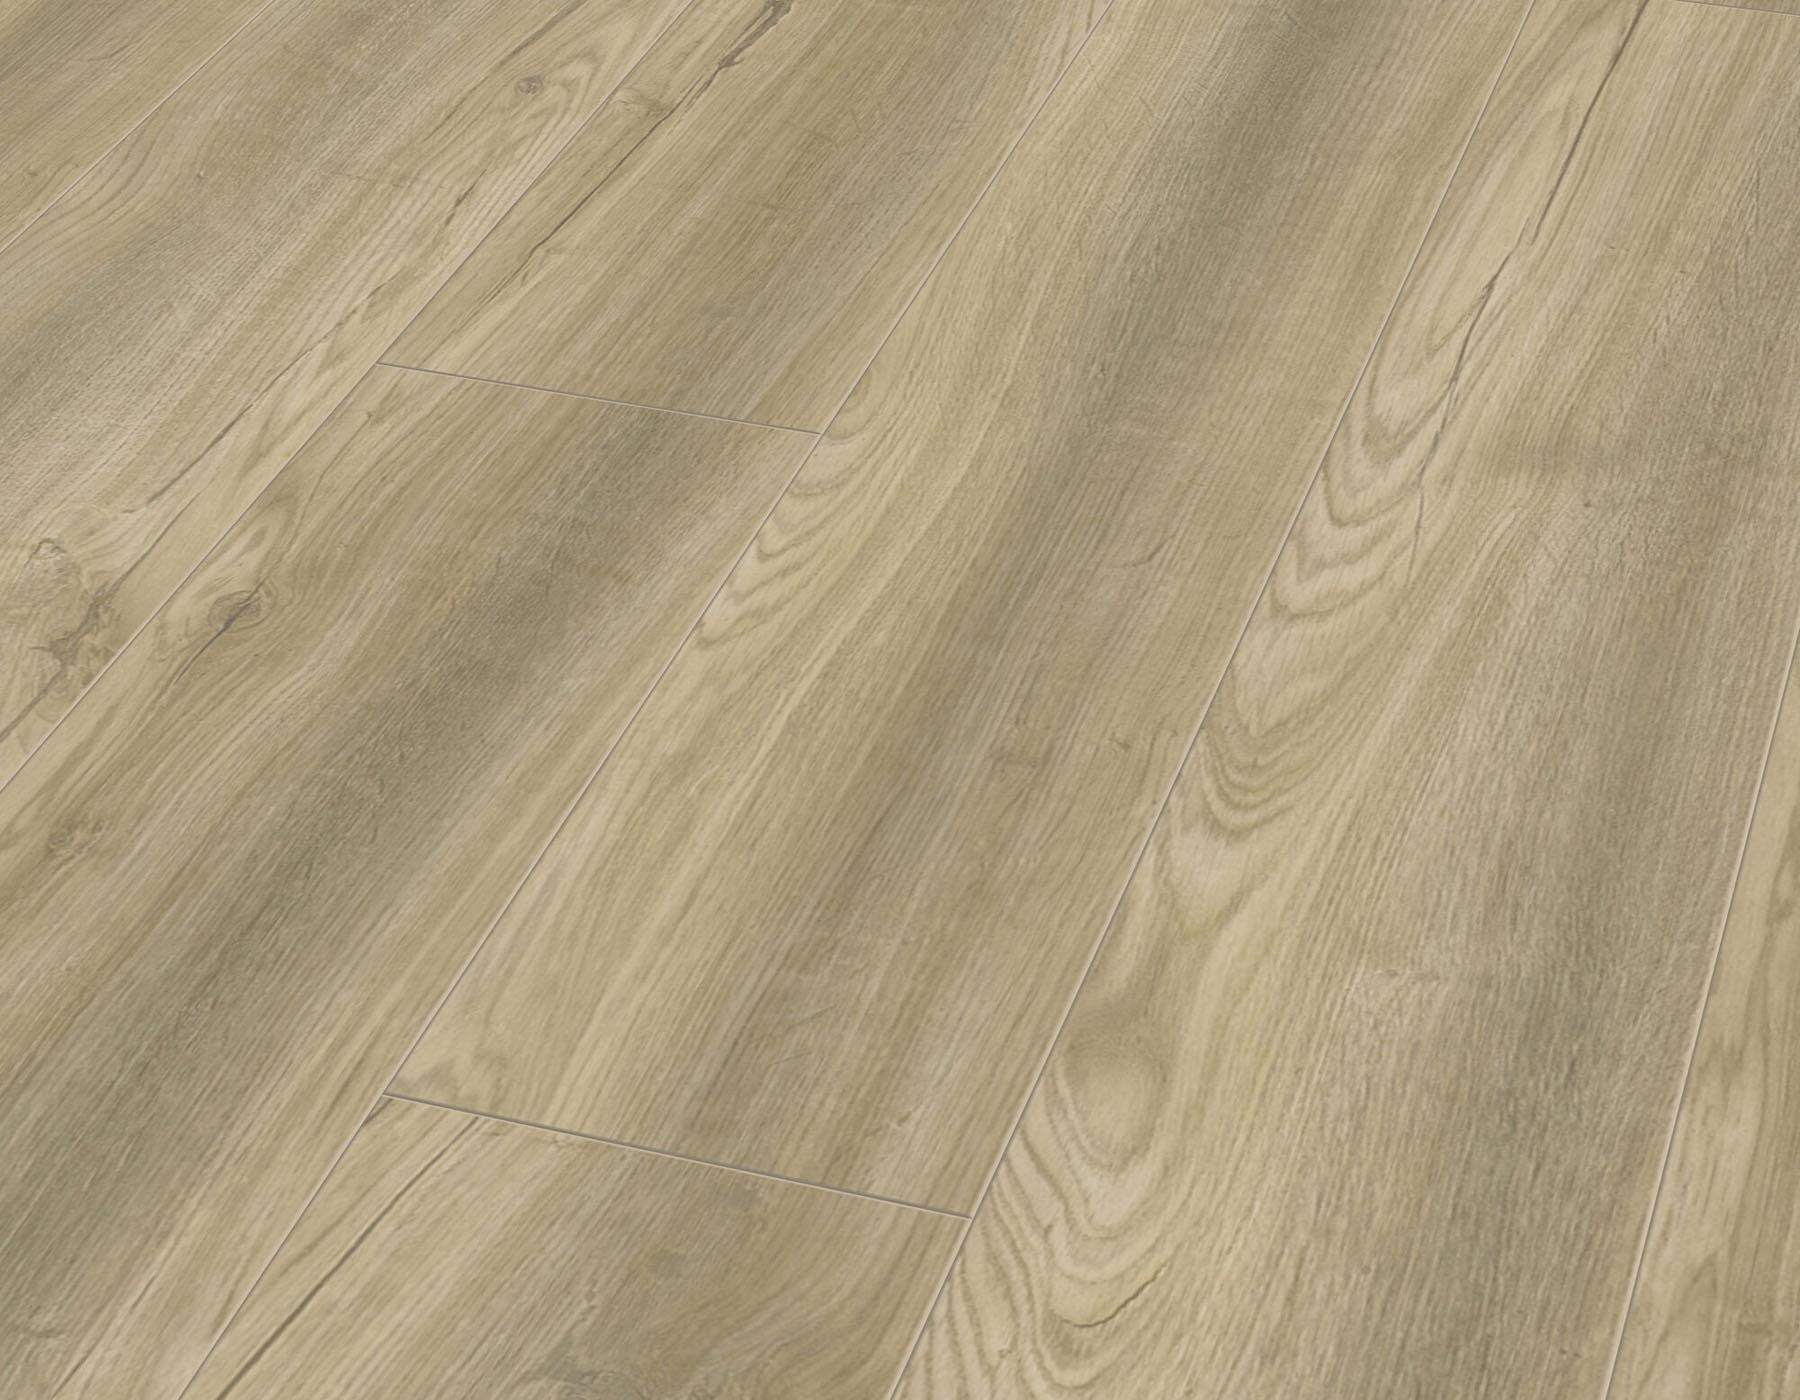 Port oak 12mmm Laminate flooring